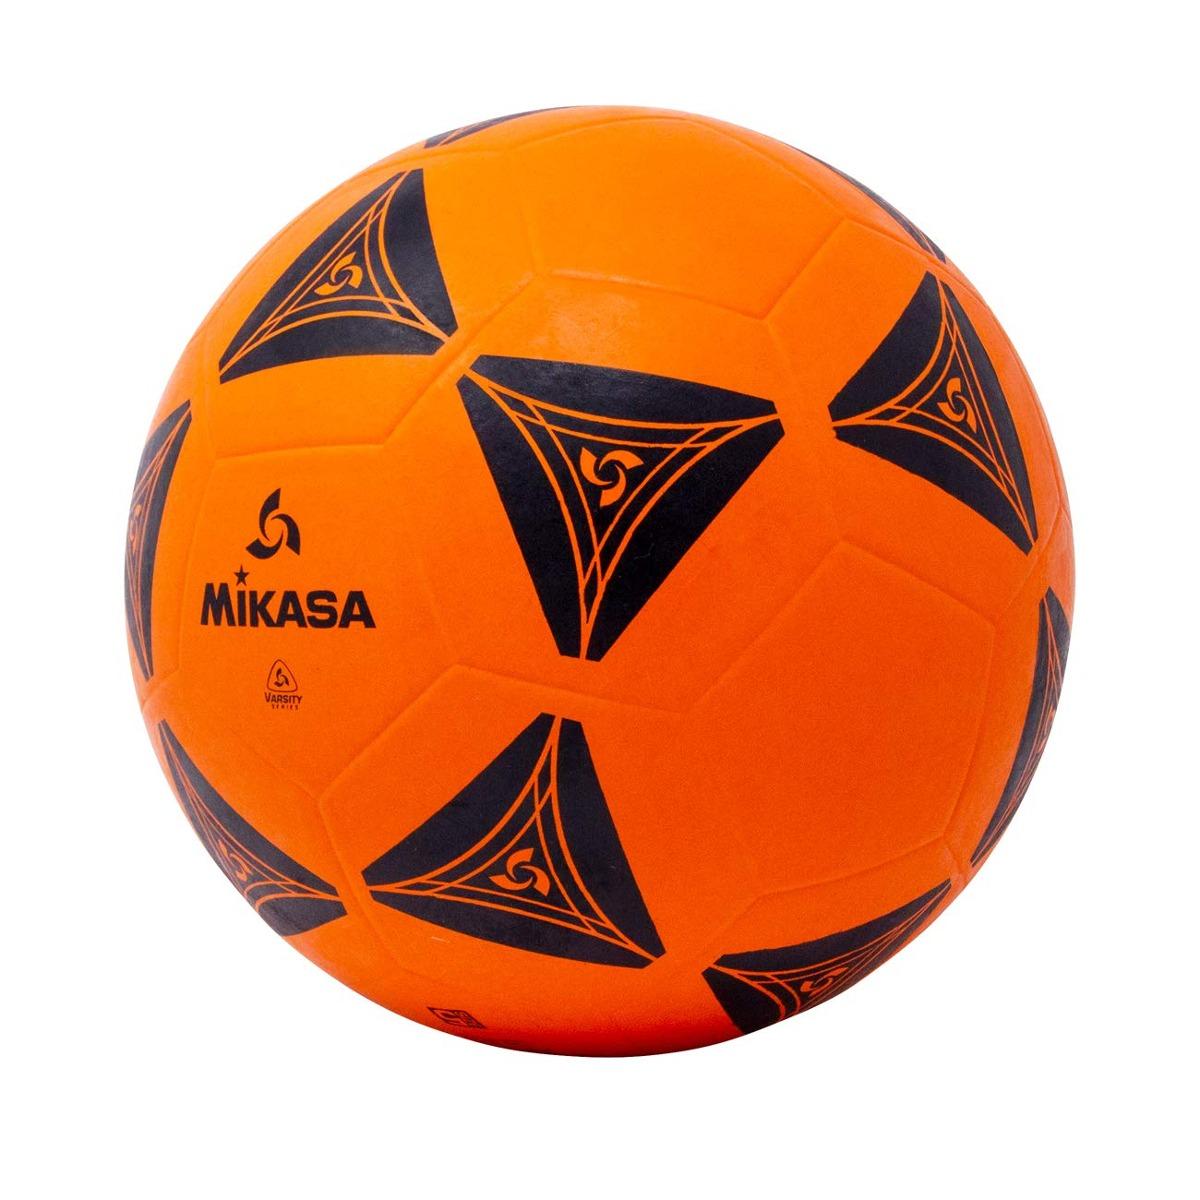 Mikasa S3030 Balón De Fútbol De Goma Para Trabajo Pesado ... 6aab19eacc1c8